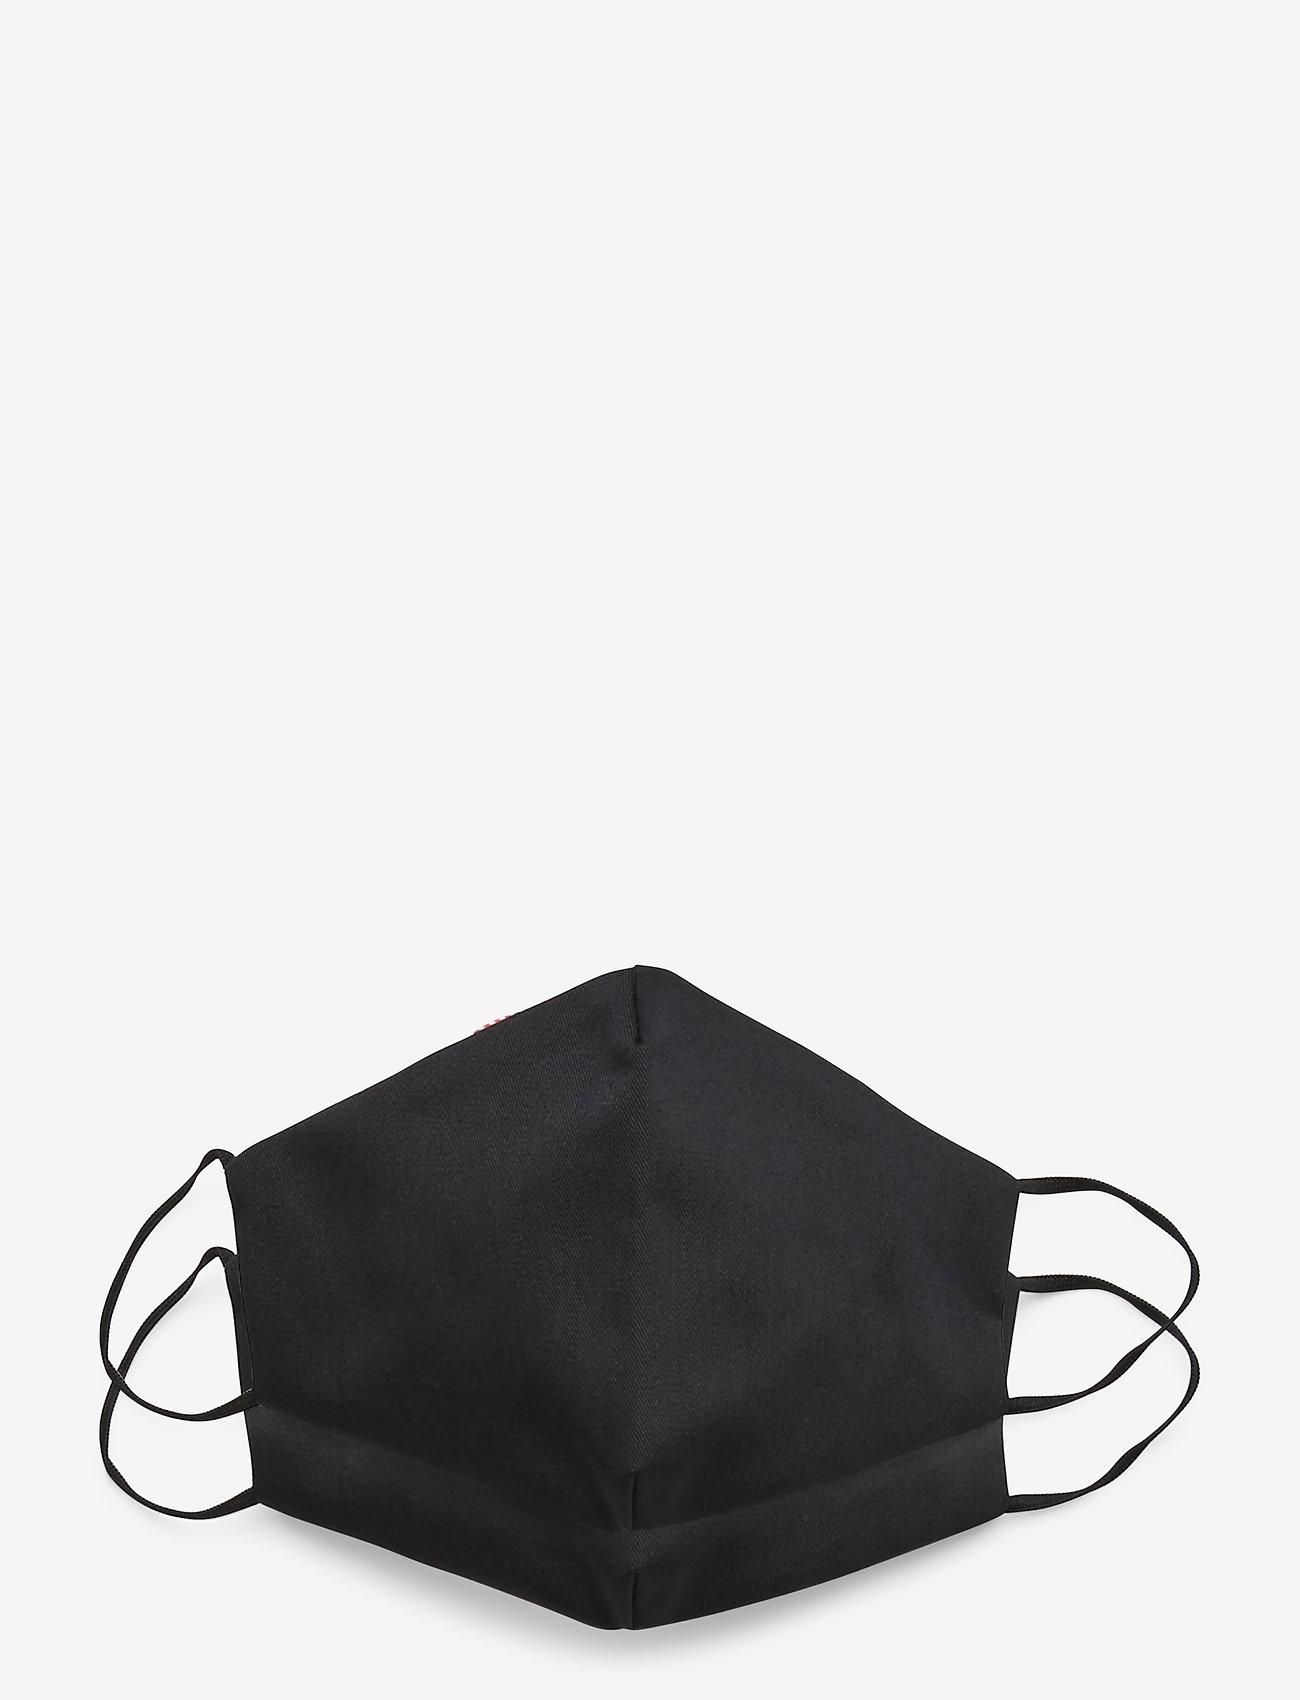 ORAS24 - Reusable face mask,2 pack, Kids 2-10 - maski na twarz - black - 0